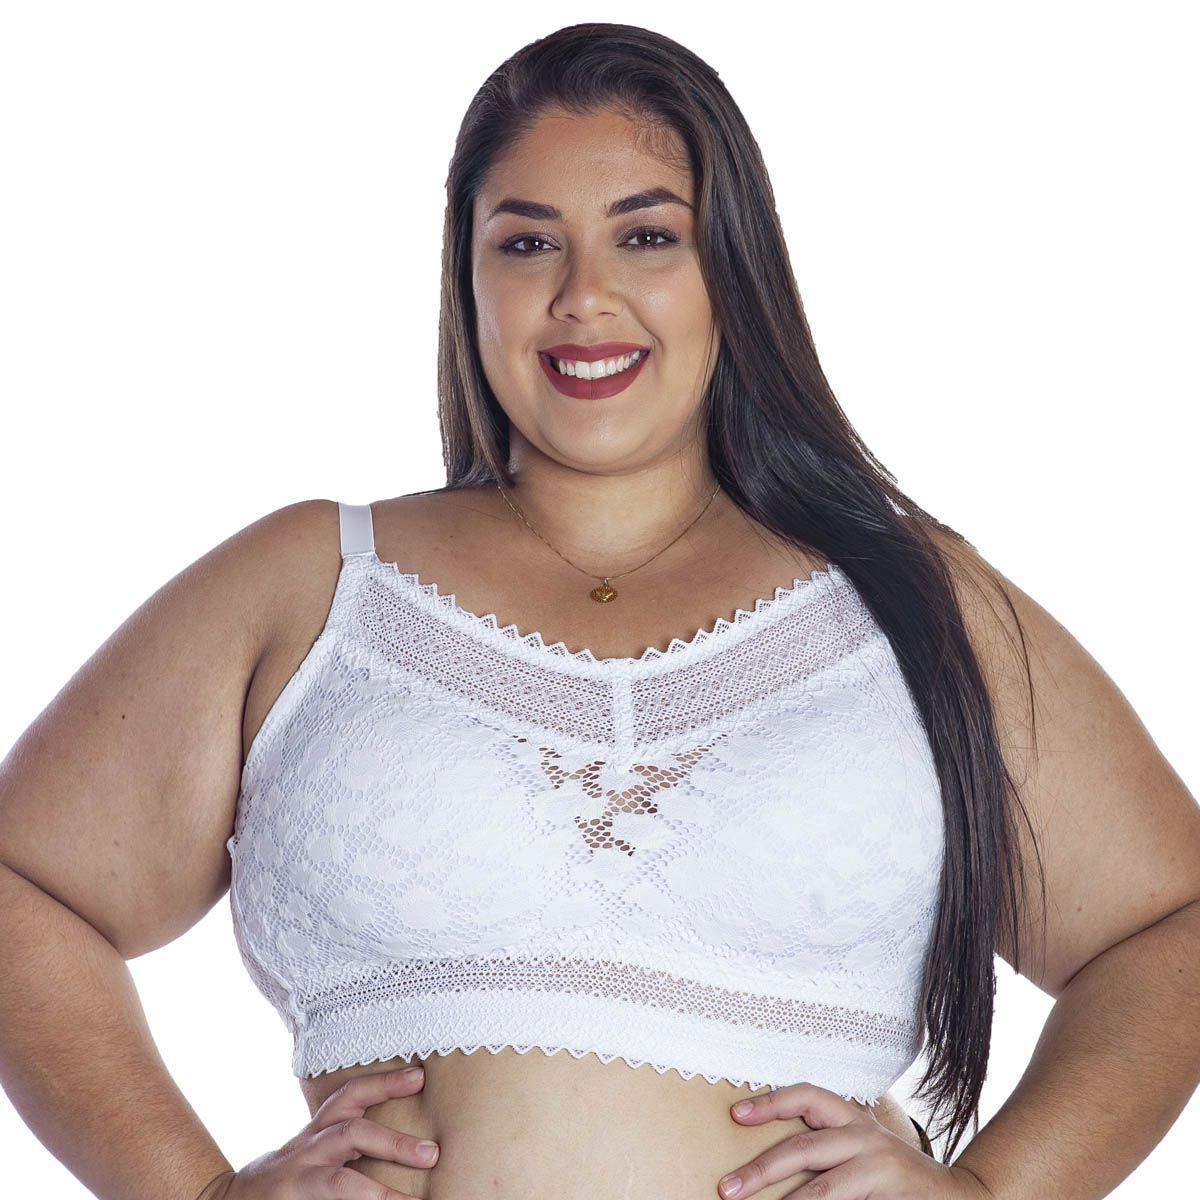 Sutiã Plus Size Rendado Com Bojo Sem Aro Nayane Rodrigues .